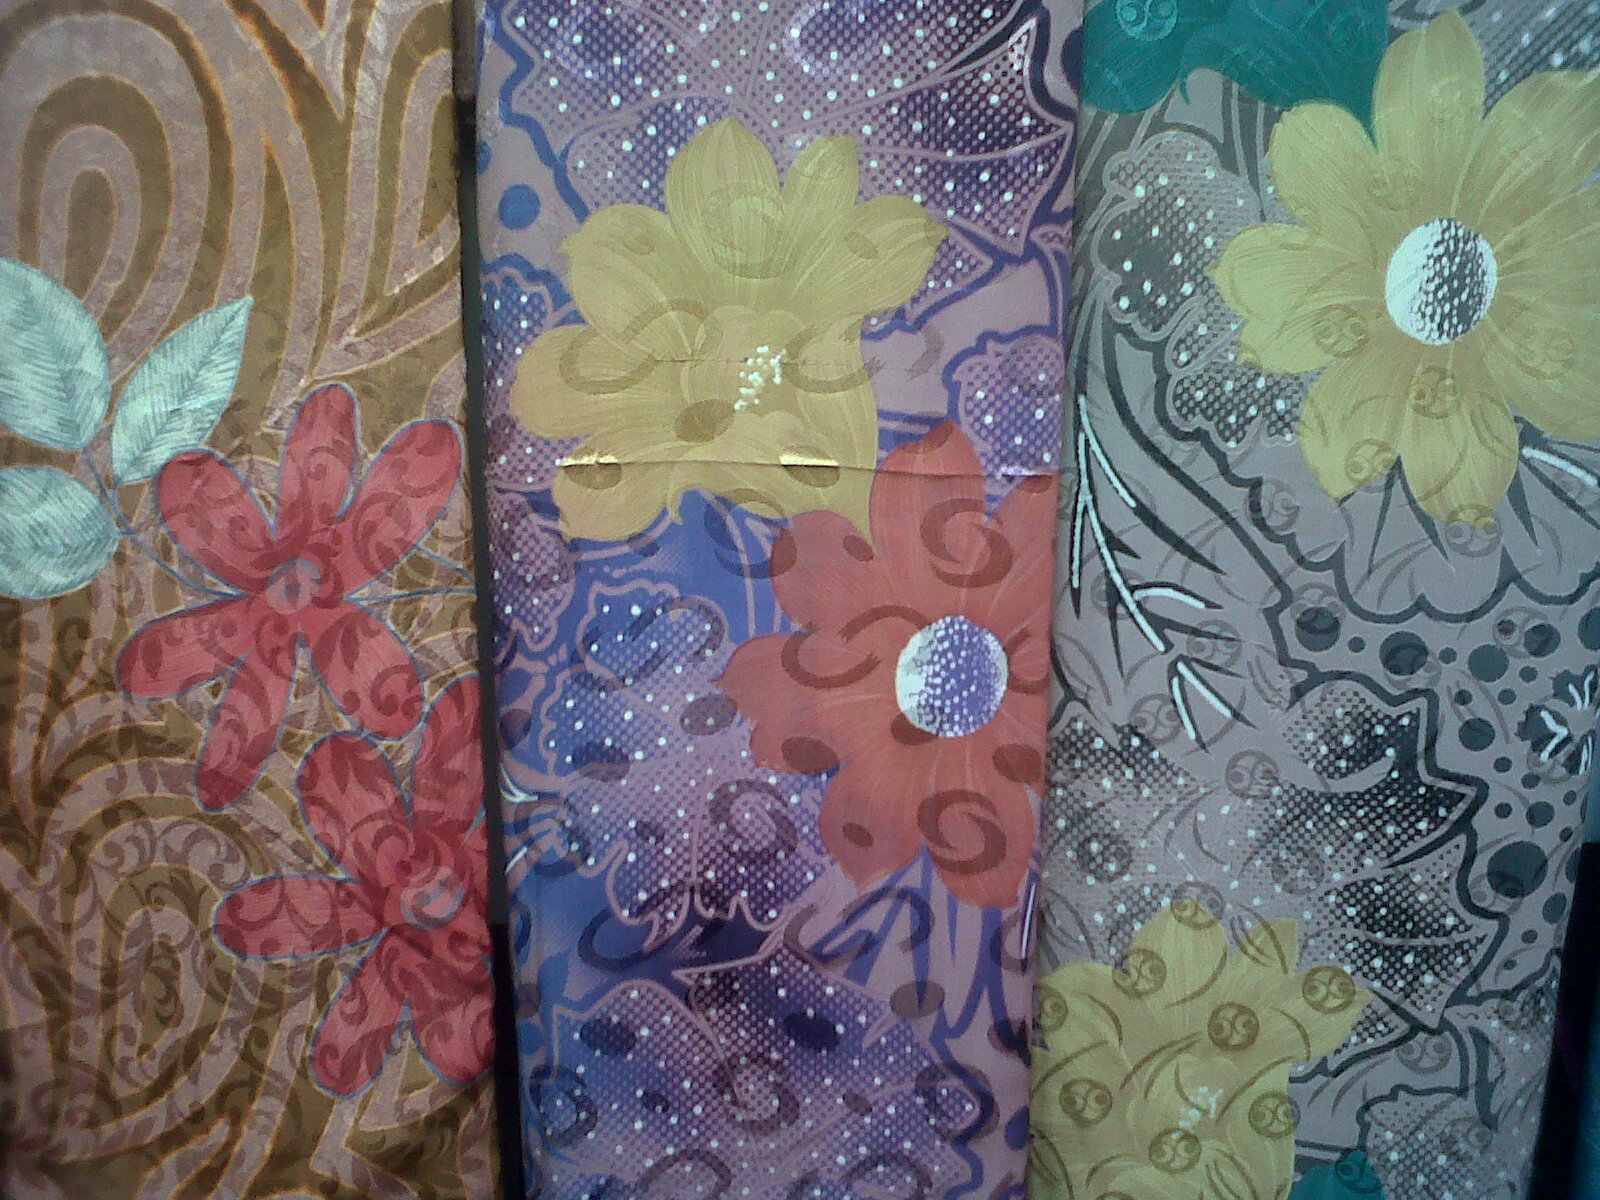 Jom shopping di blog saya, tel/sms no: 012-9914112 (layari facebook